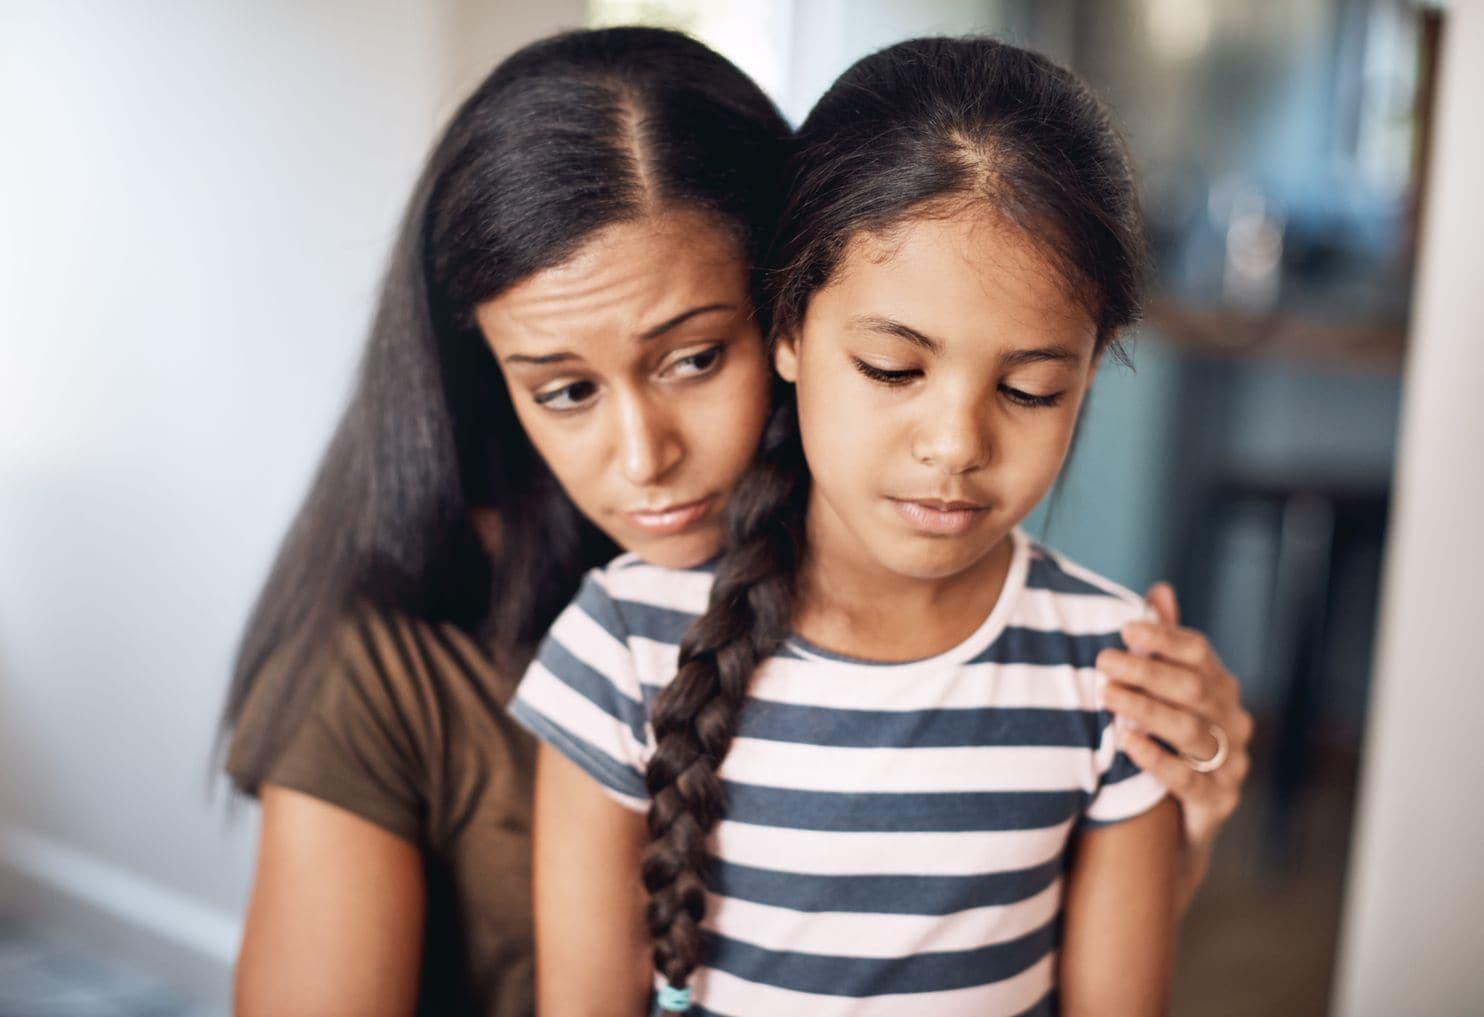 When I got dumped, I didn't hide my heartbreak from my kids     For The Washington Post